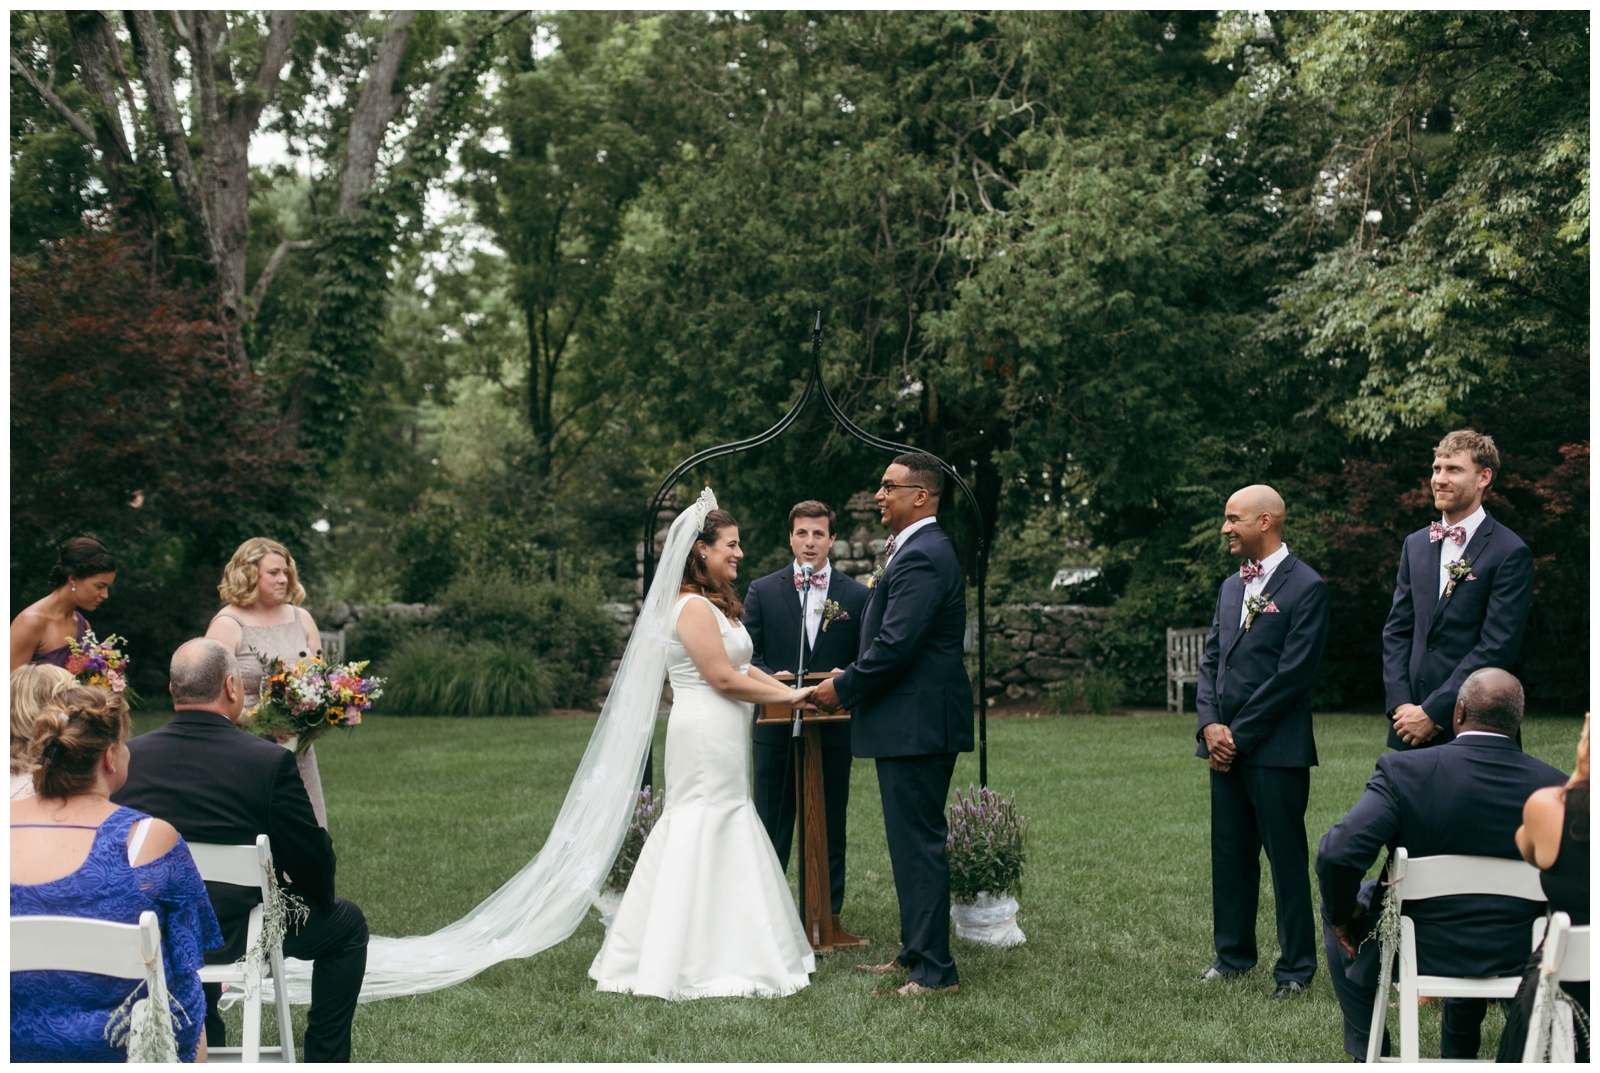 Bailey-Q-Photo-Connors-Center-Wedding-Boston-Wedding-Photographer-046.jpg